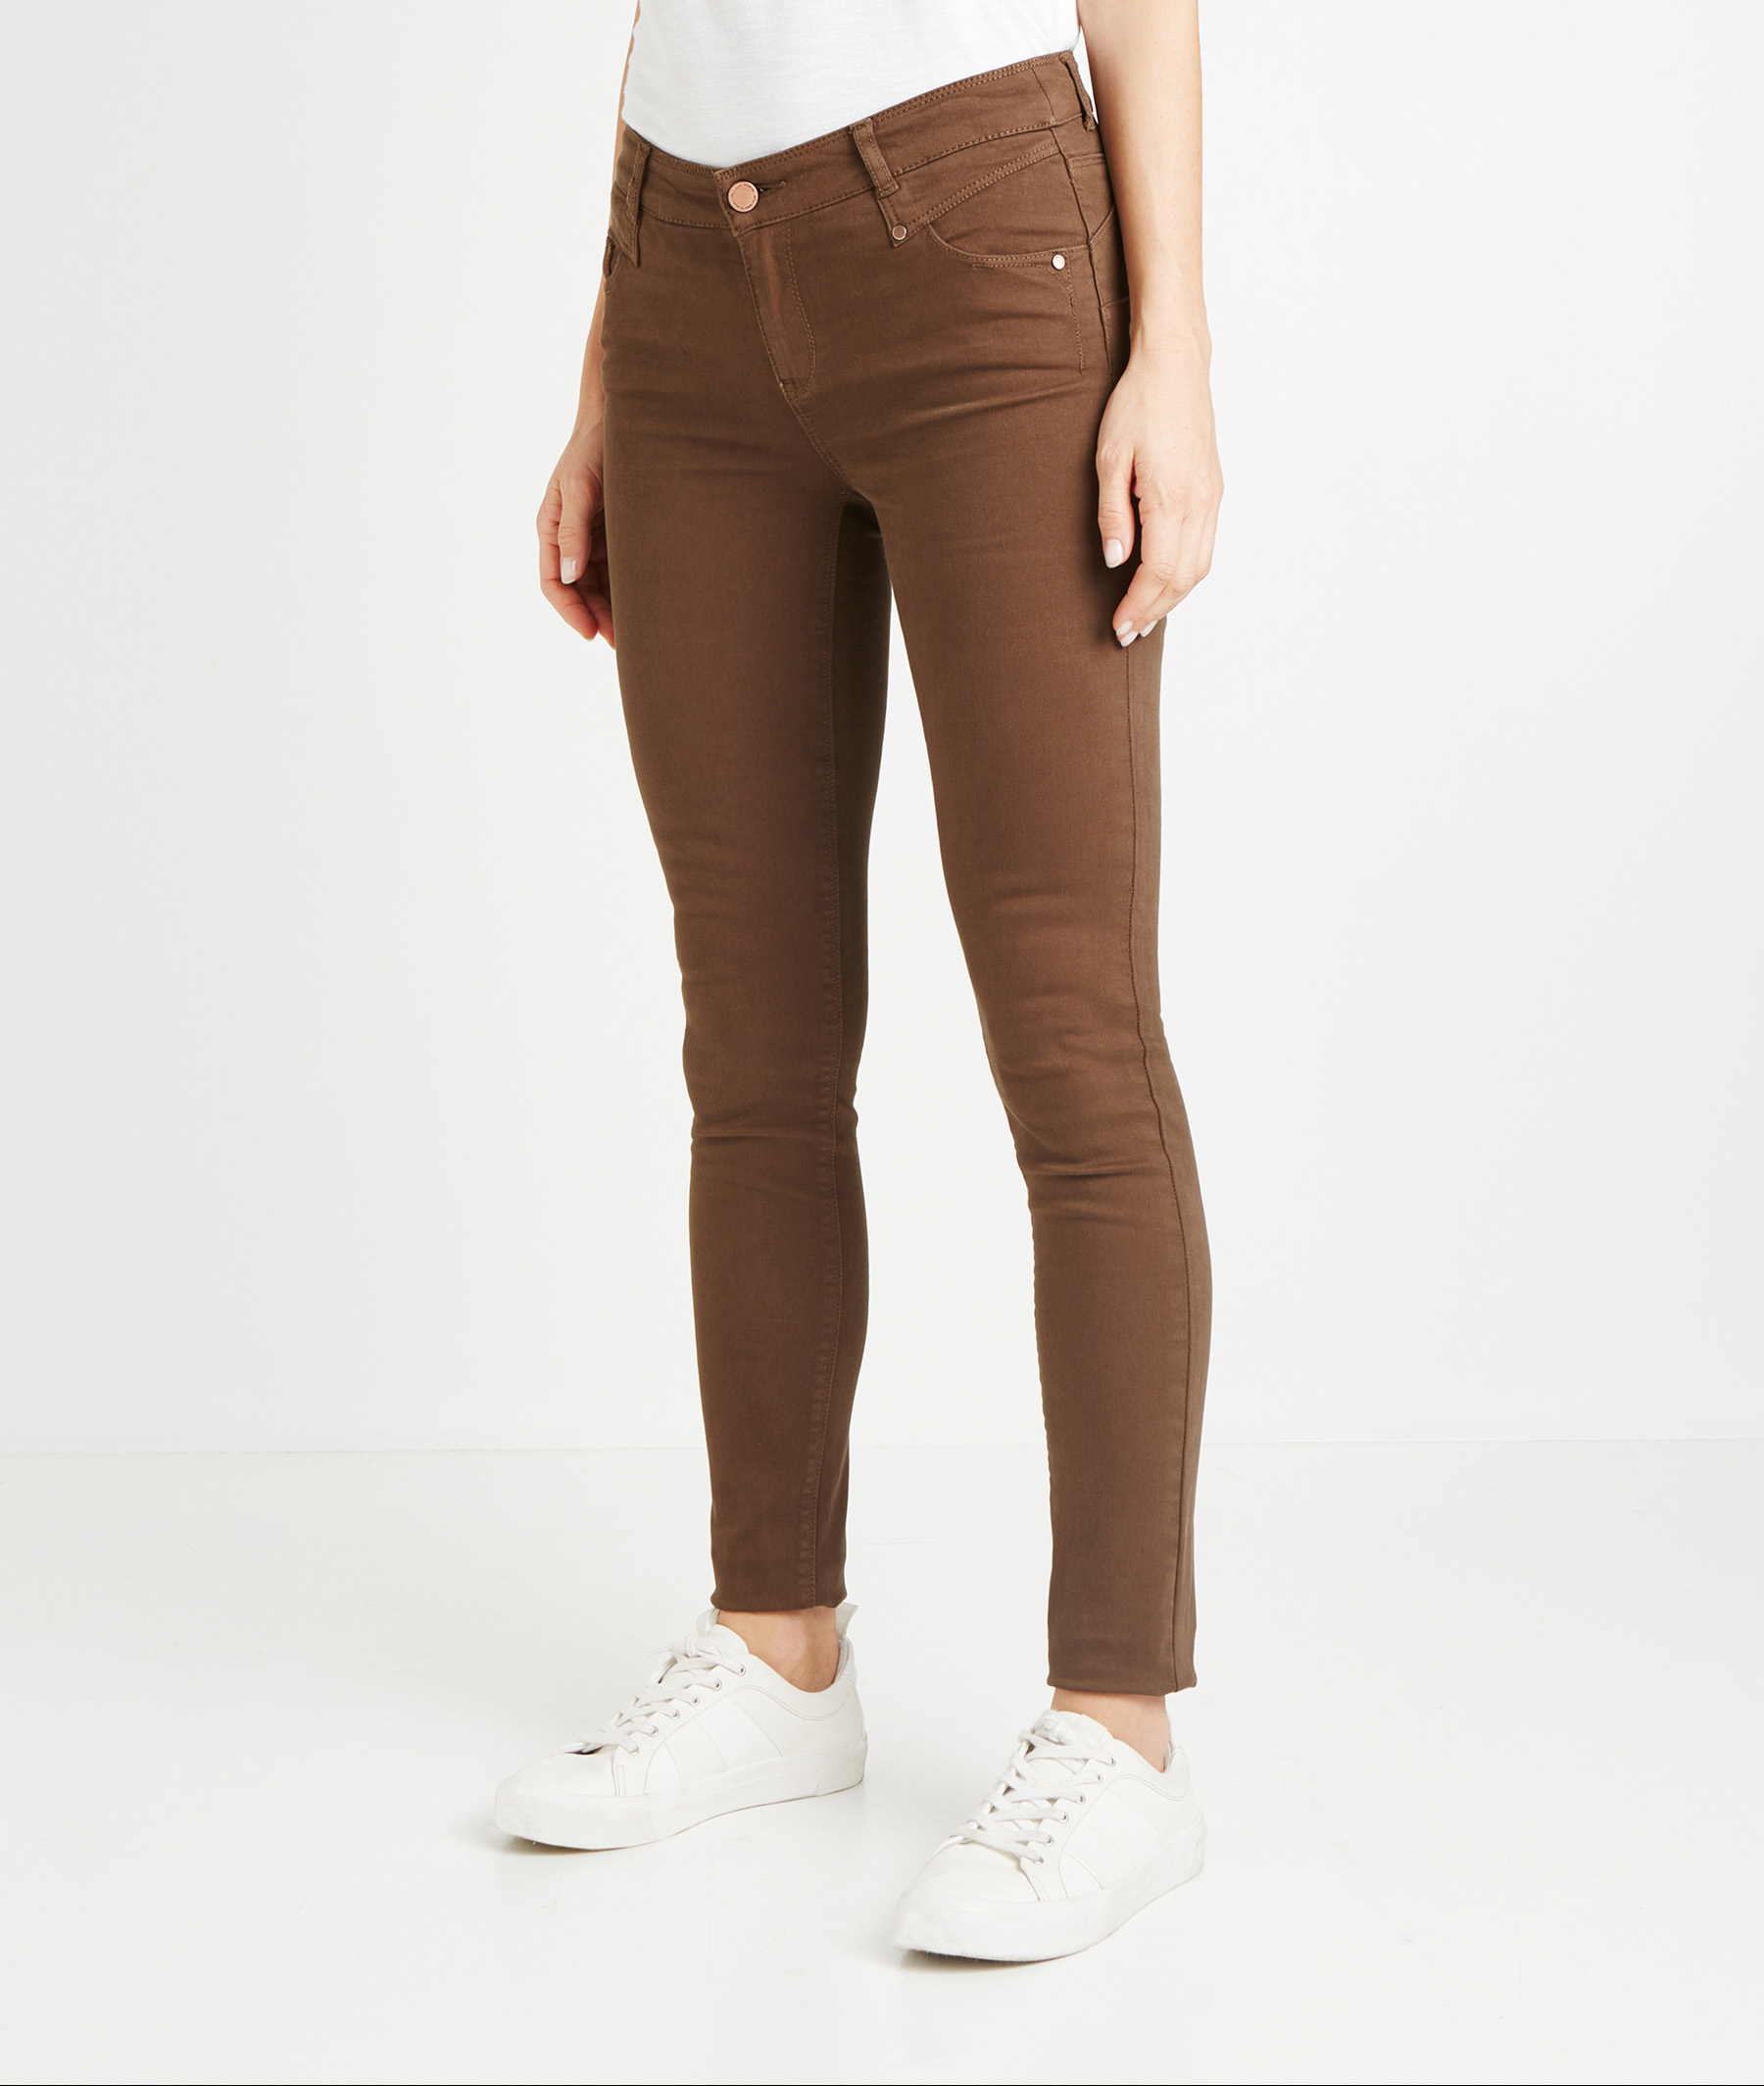 Pantalon slim push up de couleur MOKA